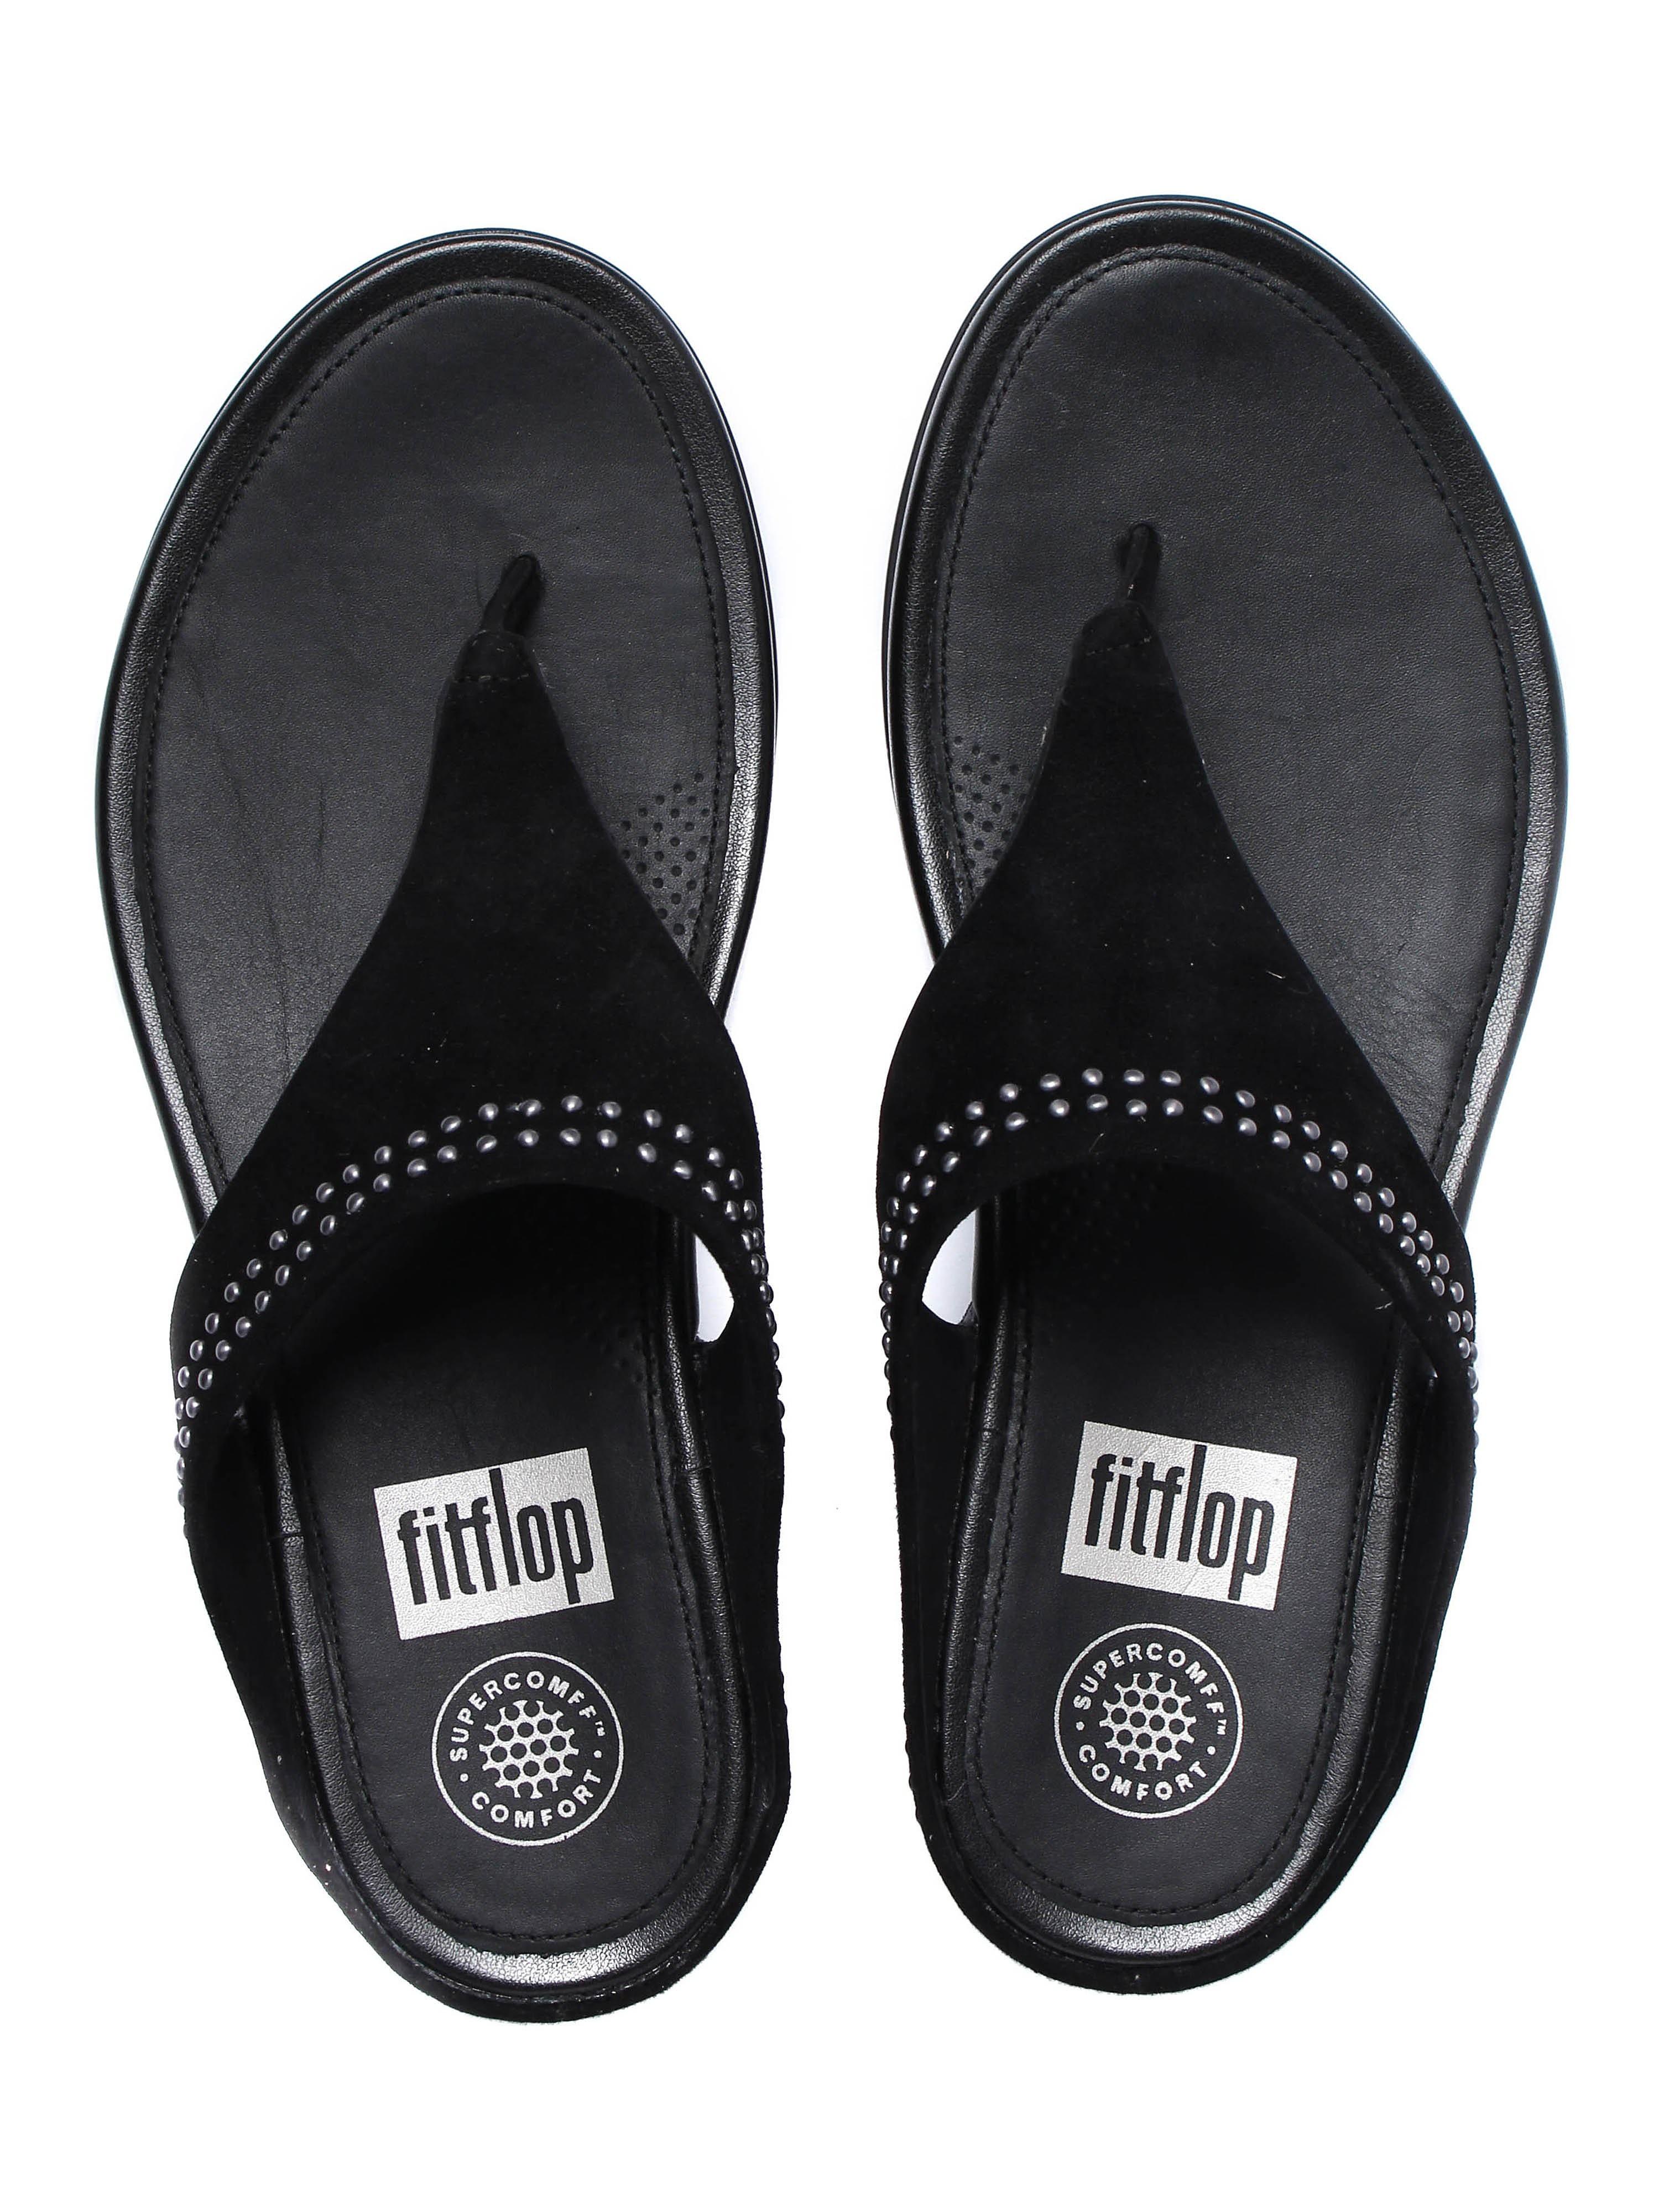 FitFlop Women's Banda Suede Toe-Post Sandals - Black